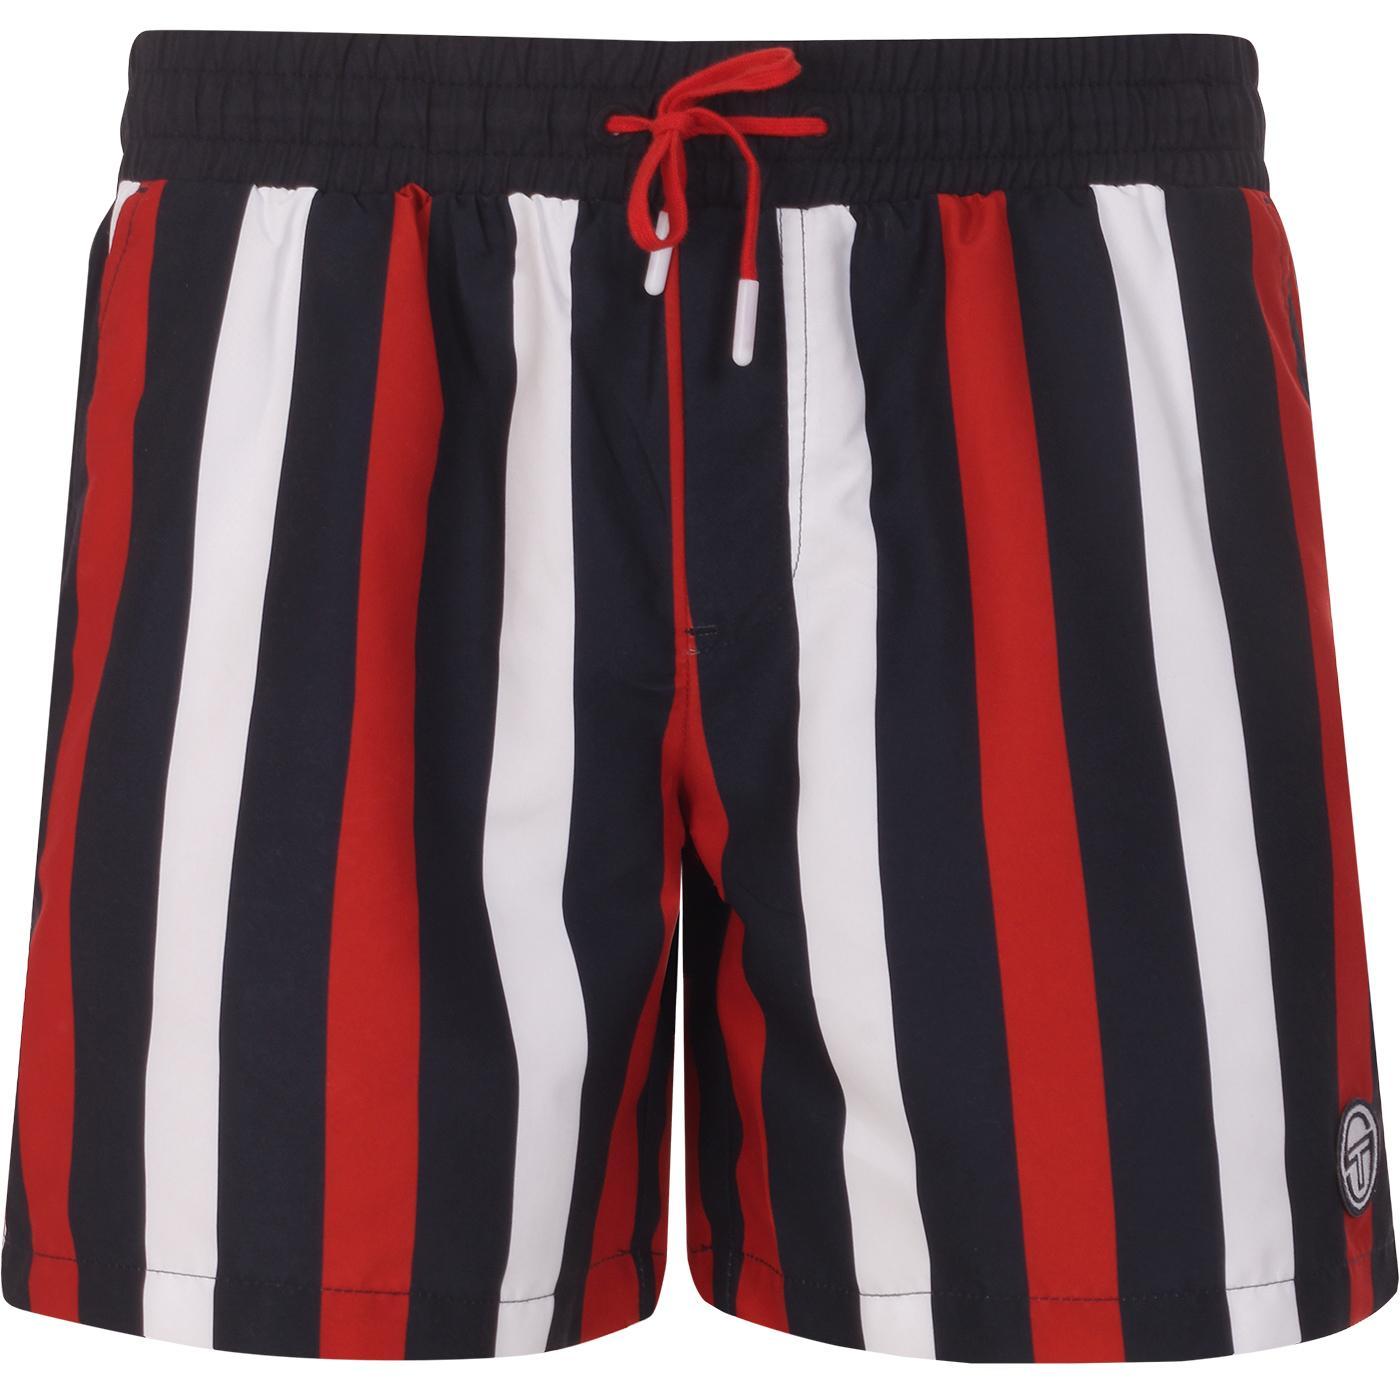 SERGIO TACCHINI Retro Stripe Swim Shorts NIGHT SKY